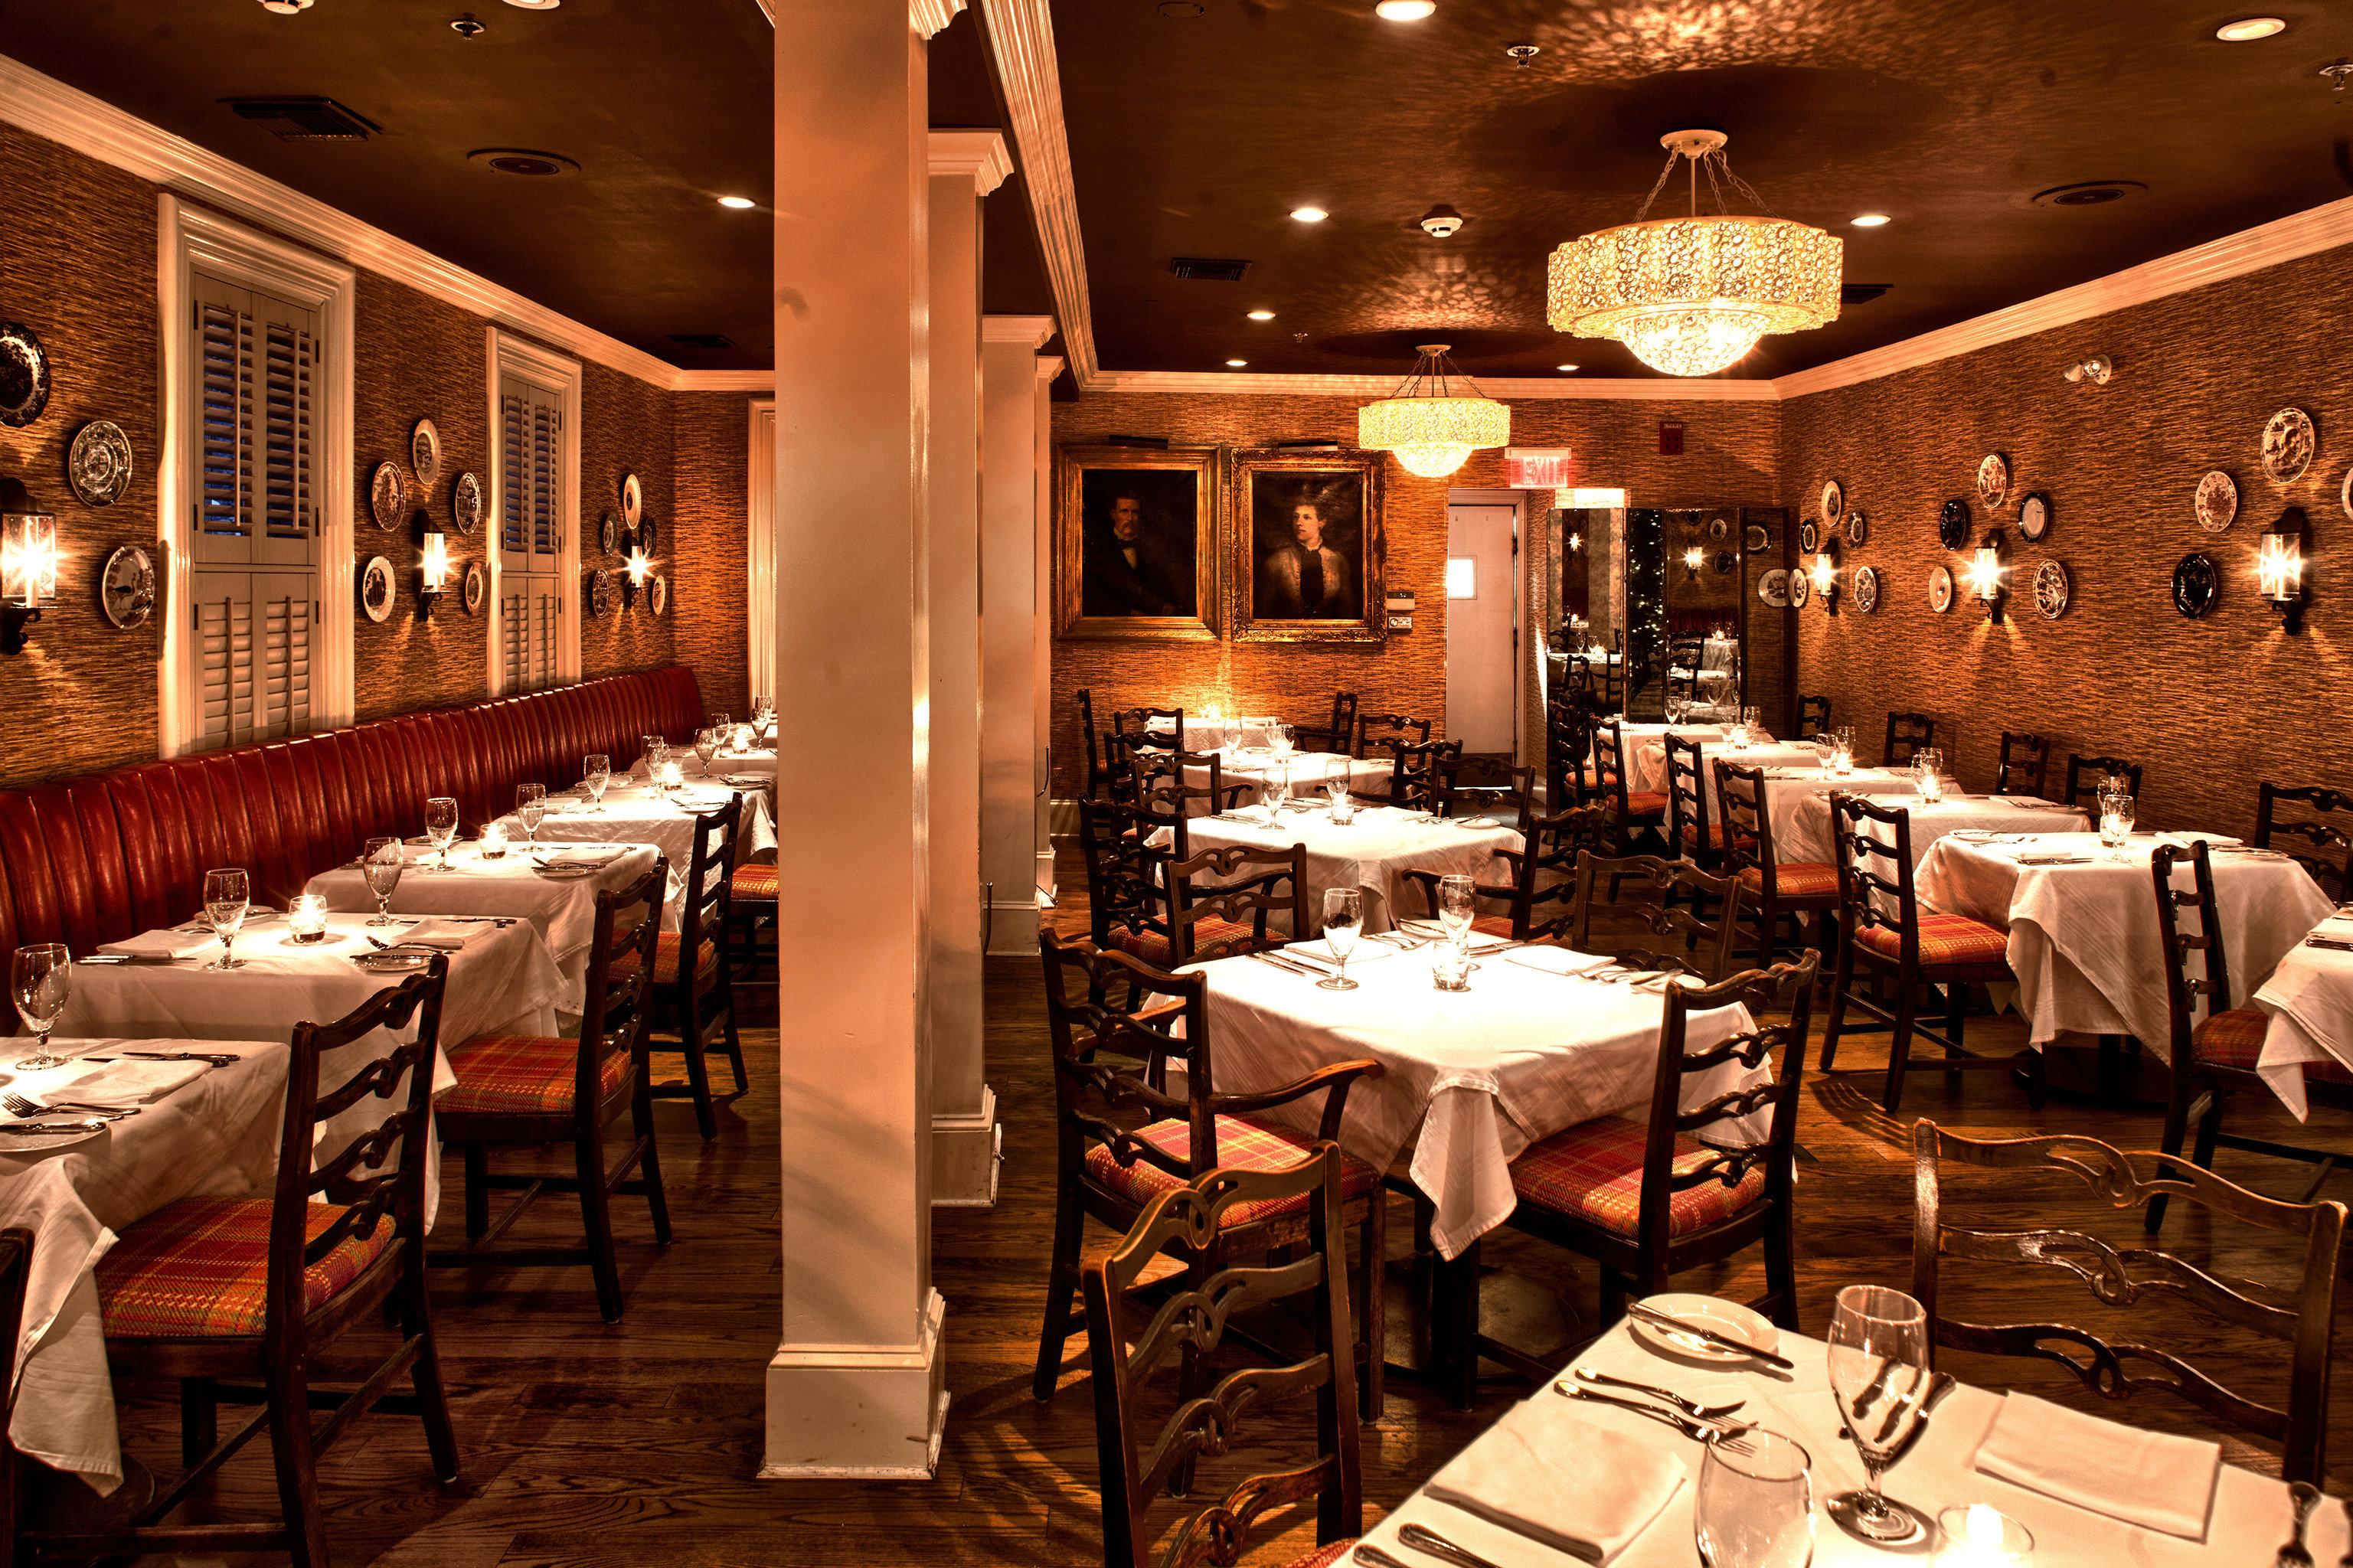 Boutique Dining Drink Eat Modern restaurant function hall ballroom basement